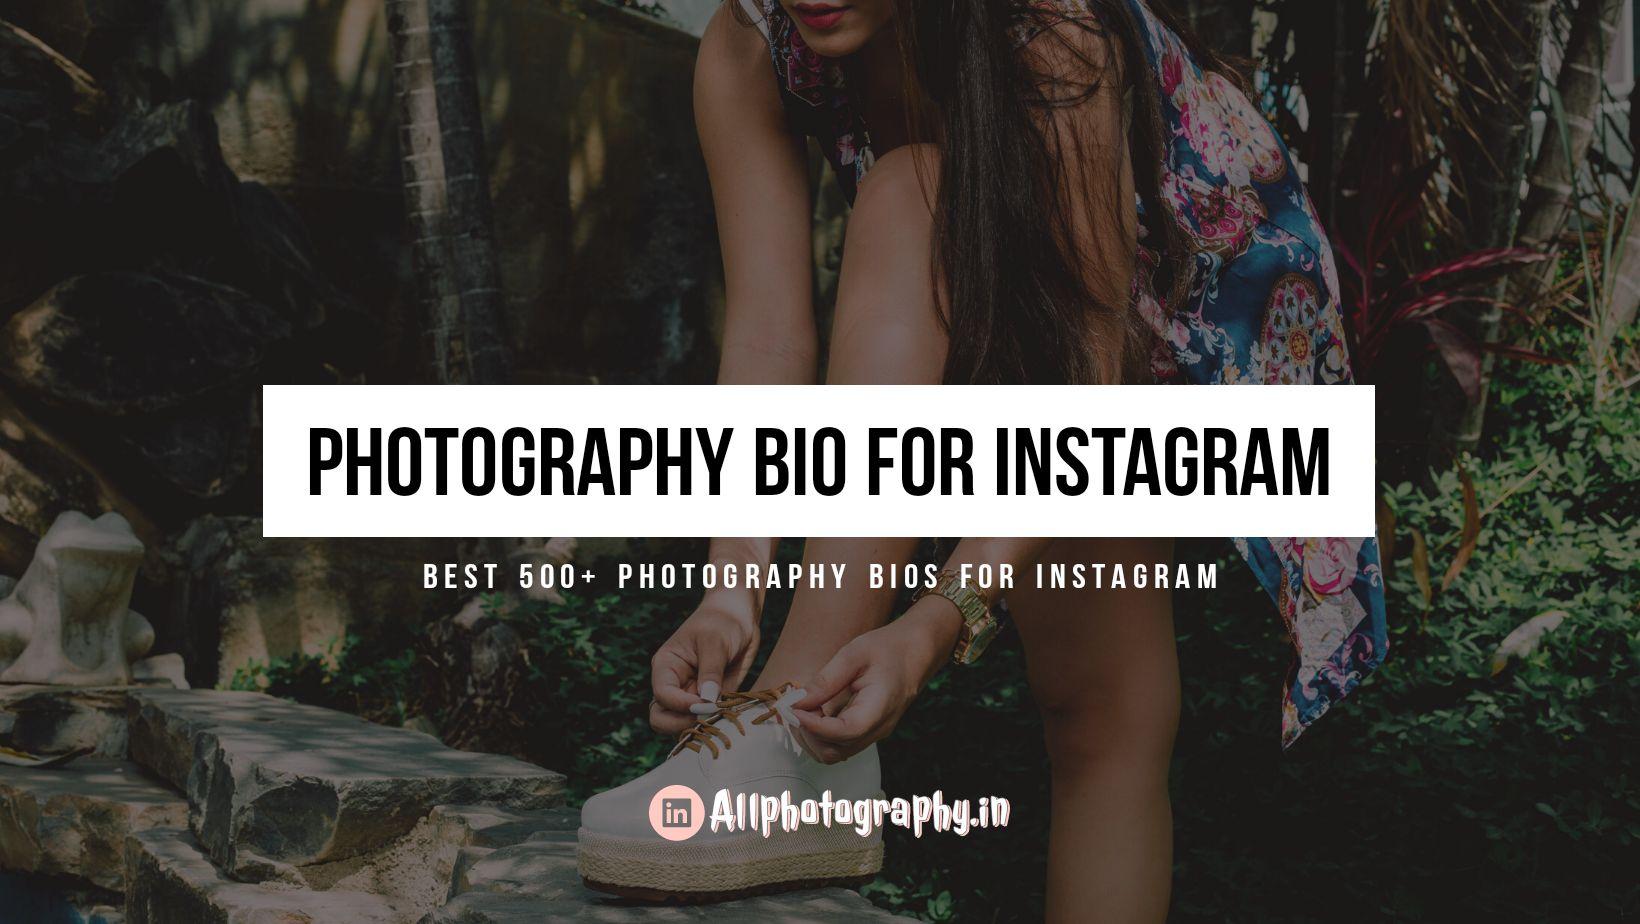 Photography bio for Instagram